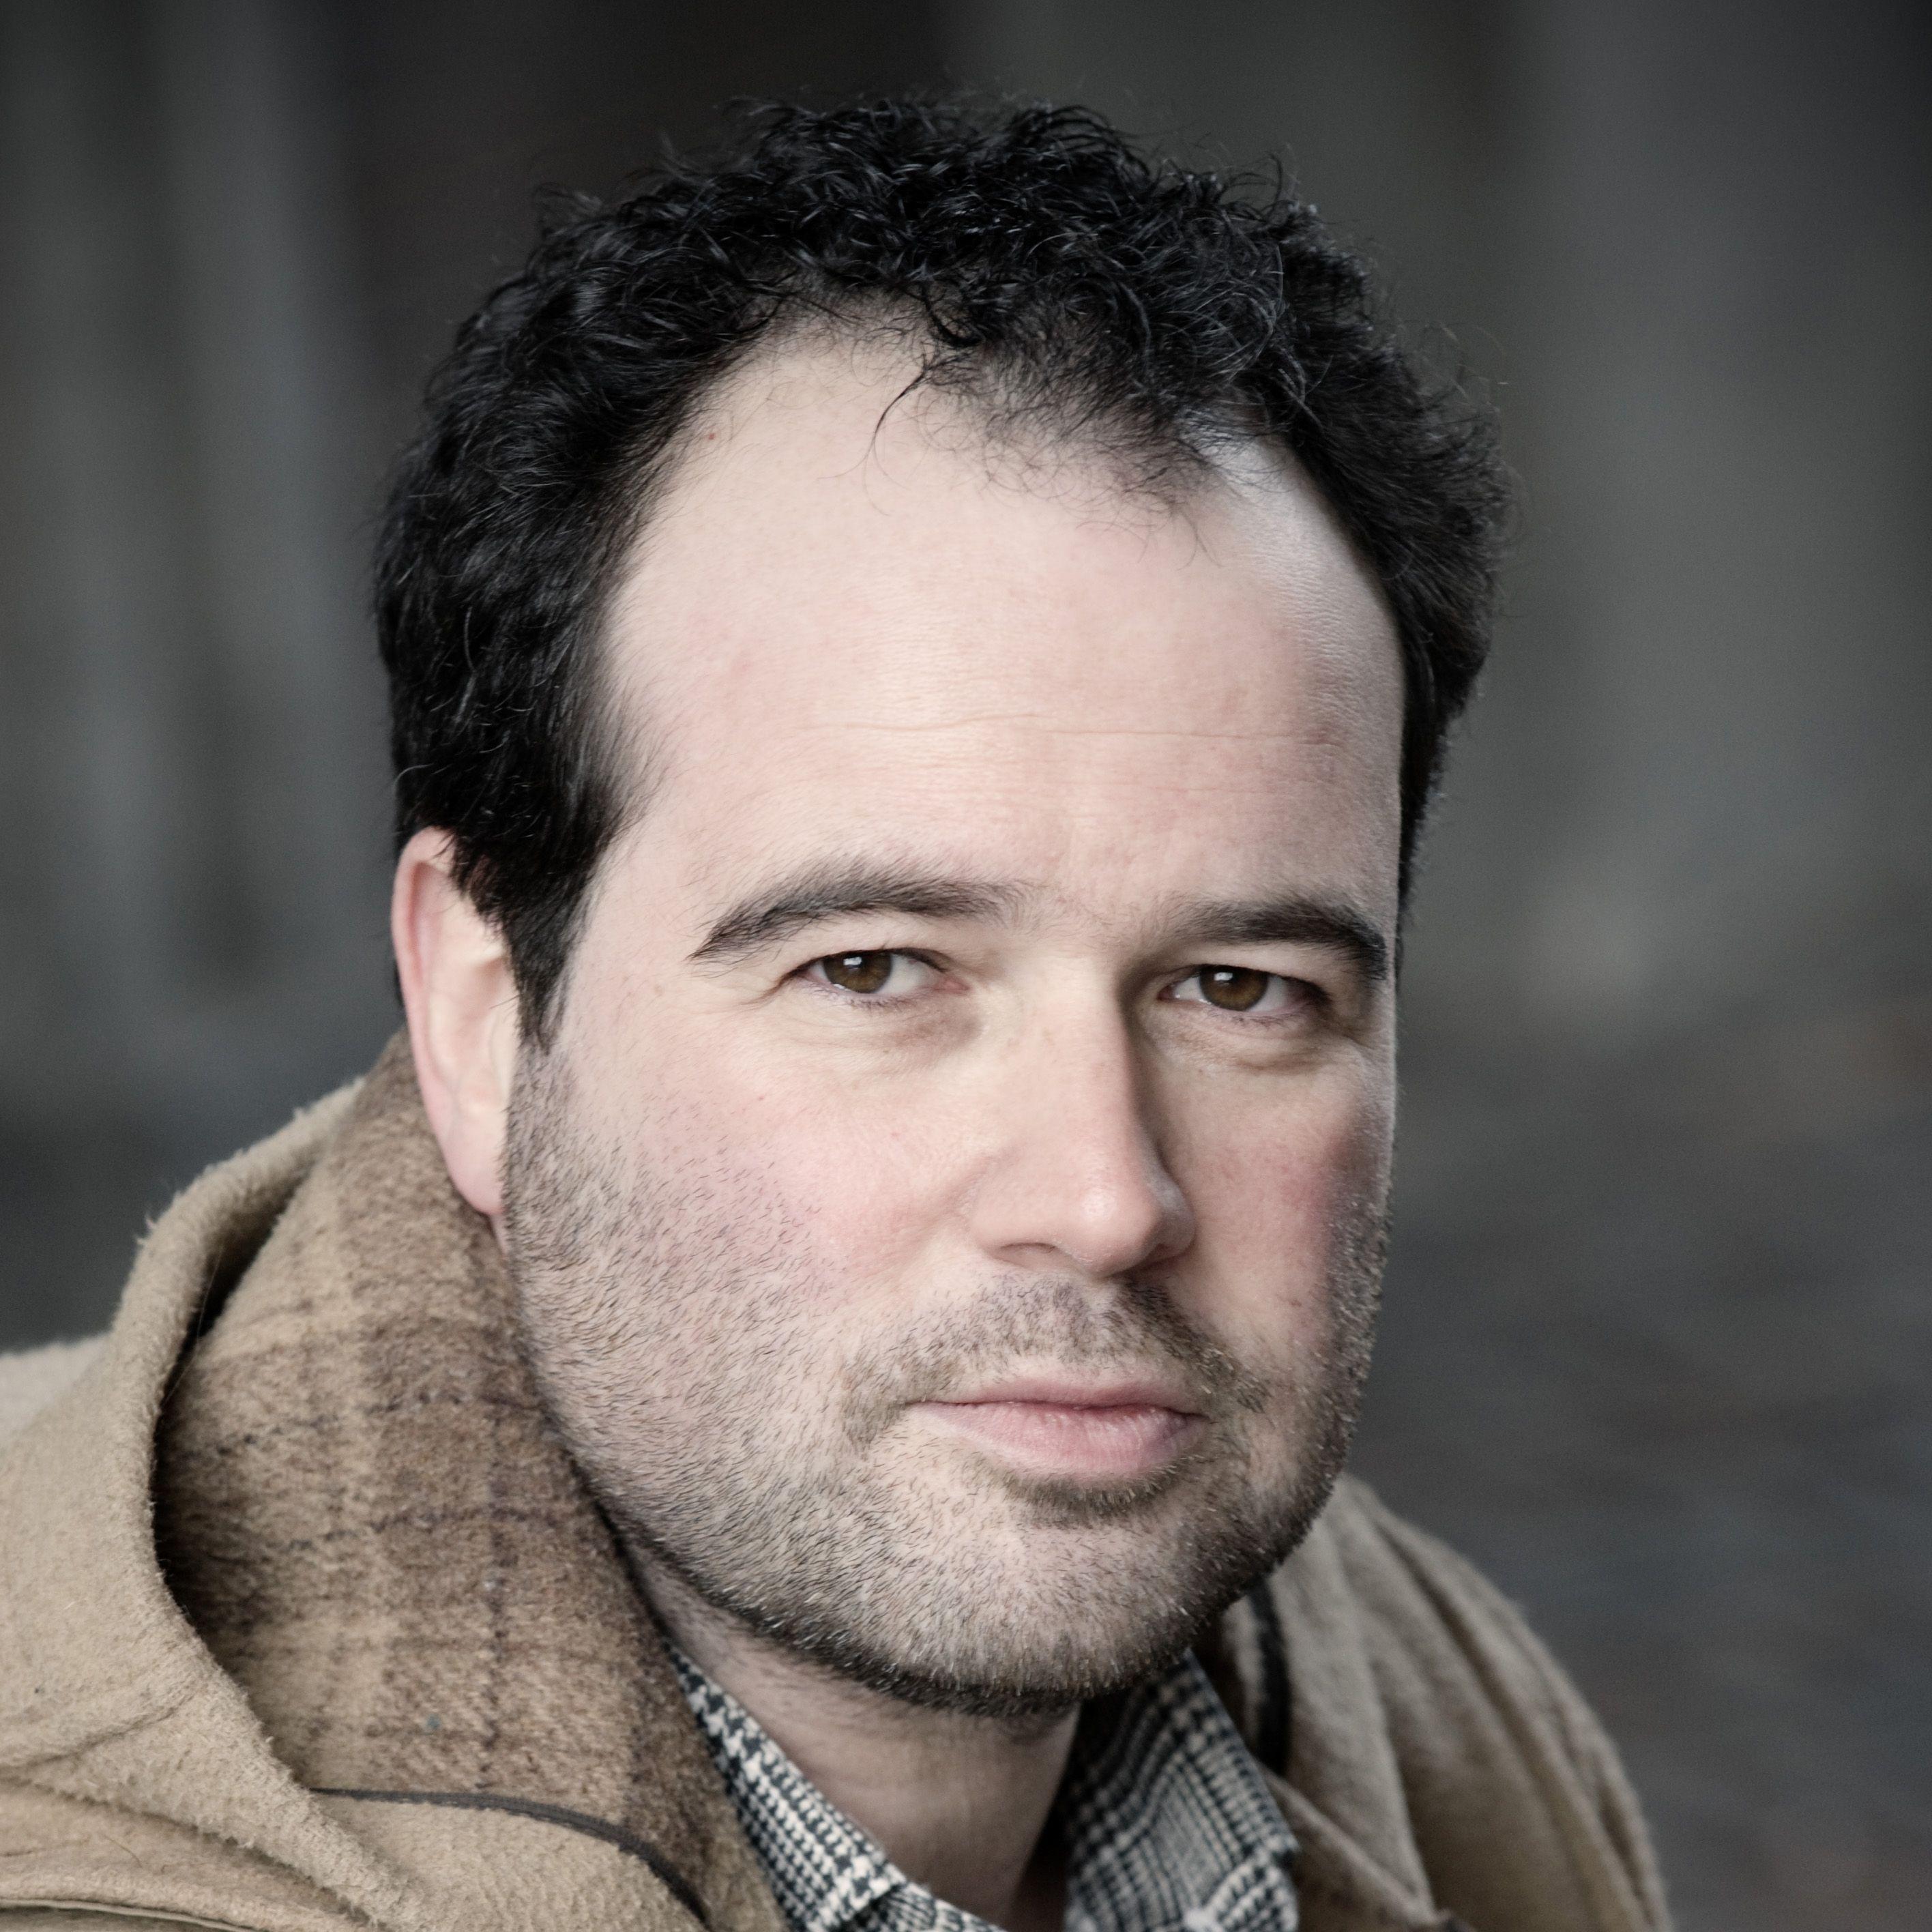 Patrick Bernhart